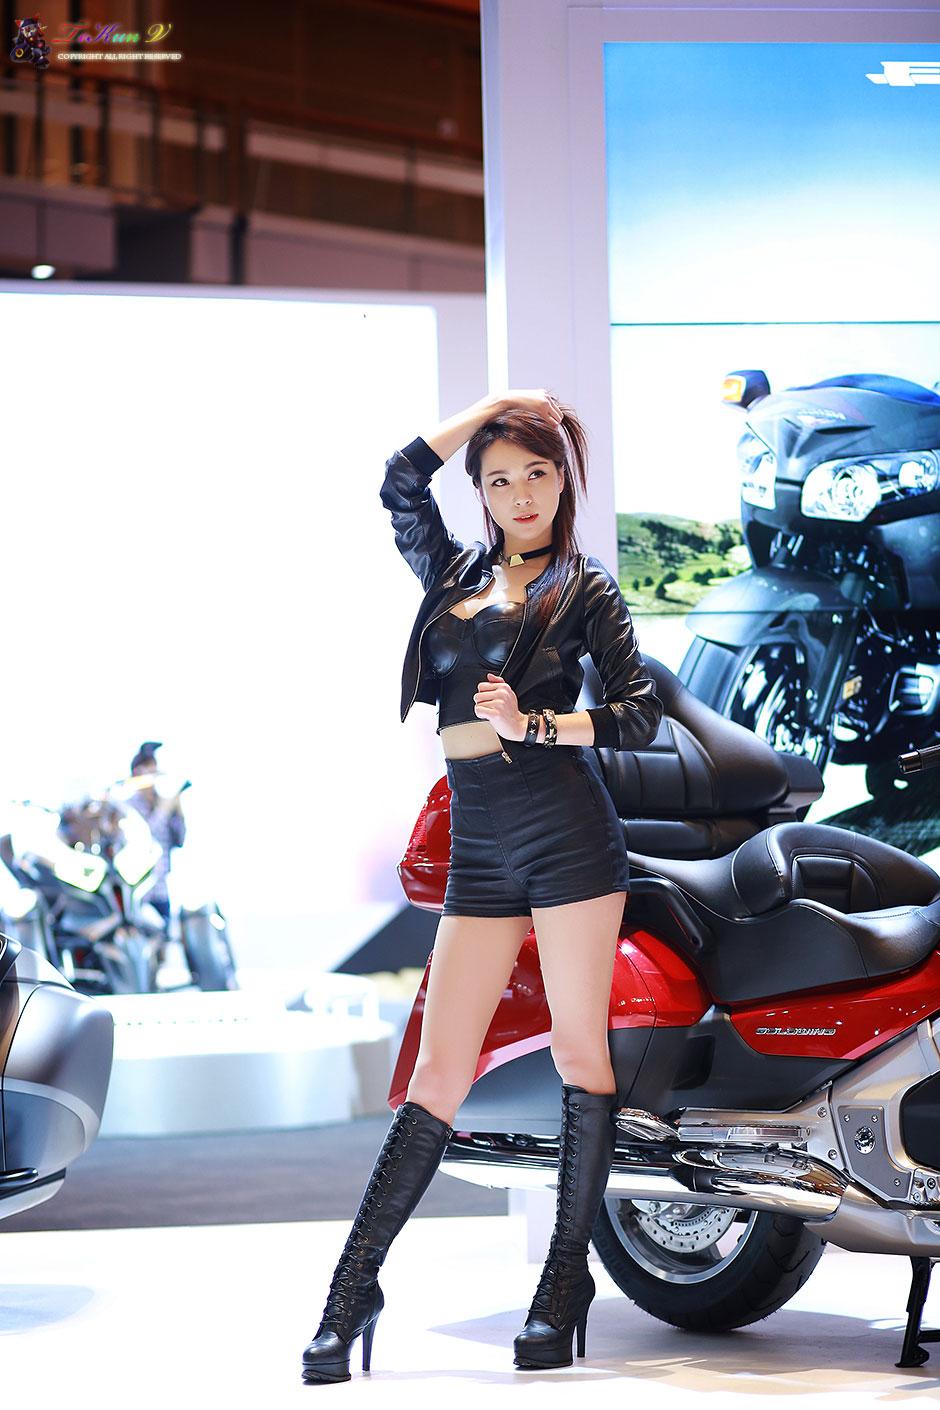 Ju Da Ha Korea Motorcycle Show 2016 Honda